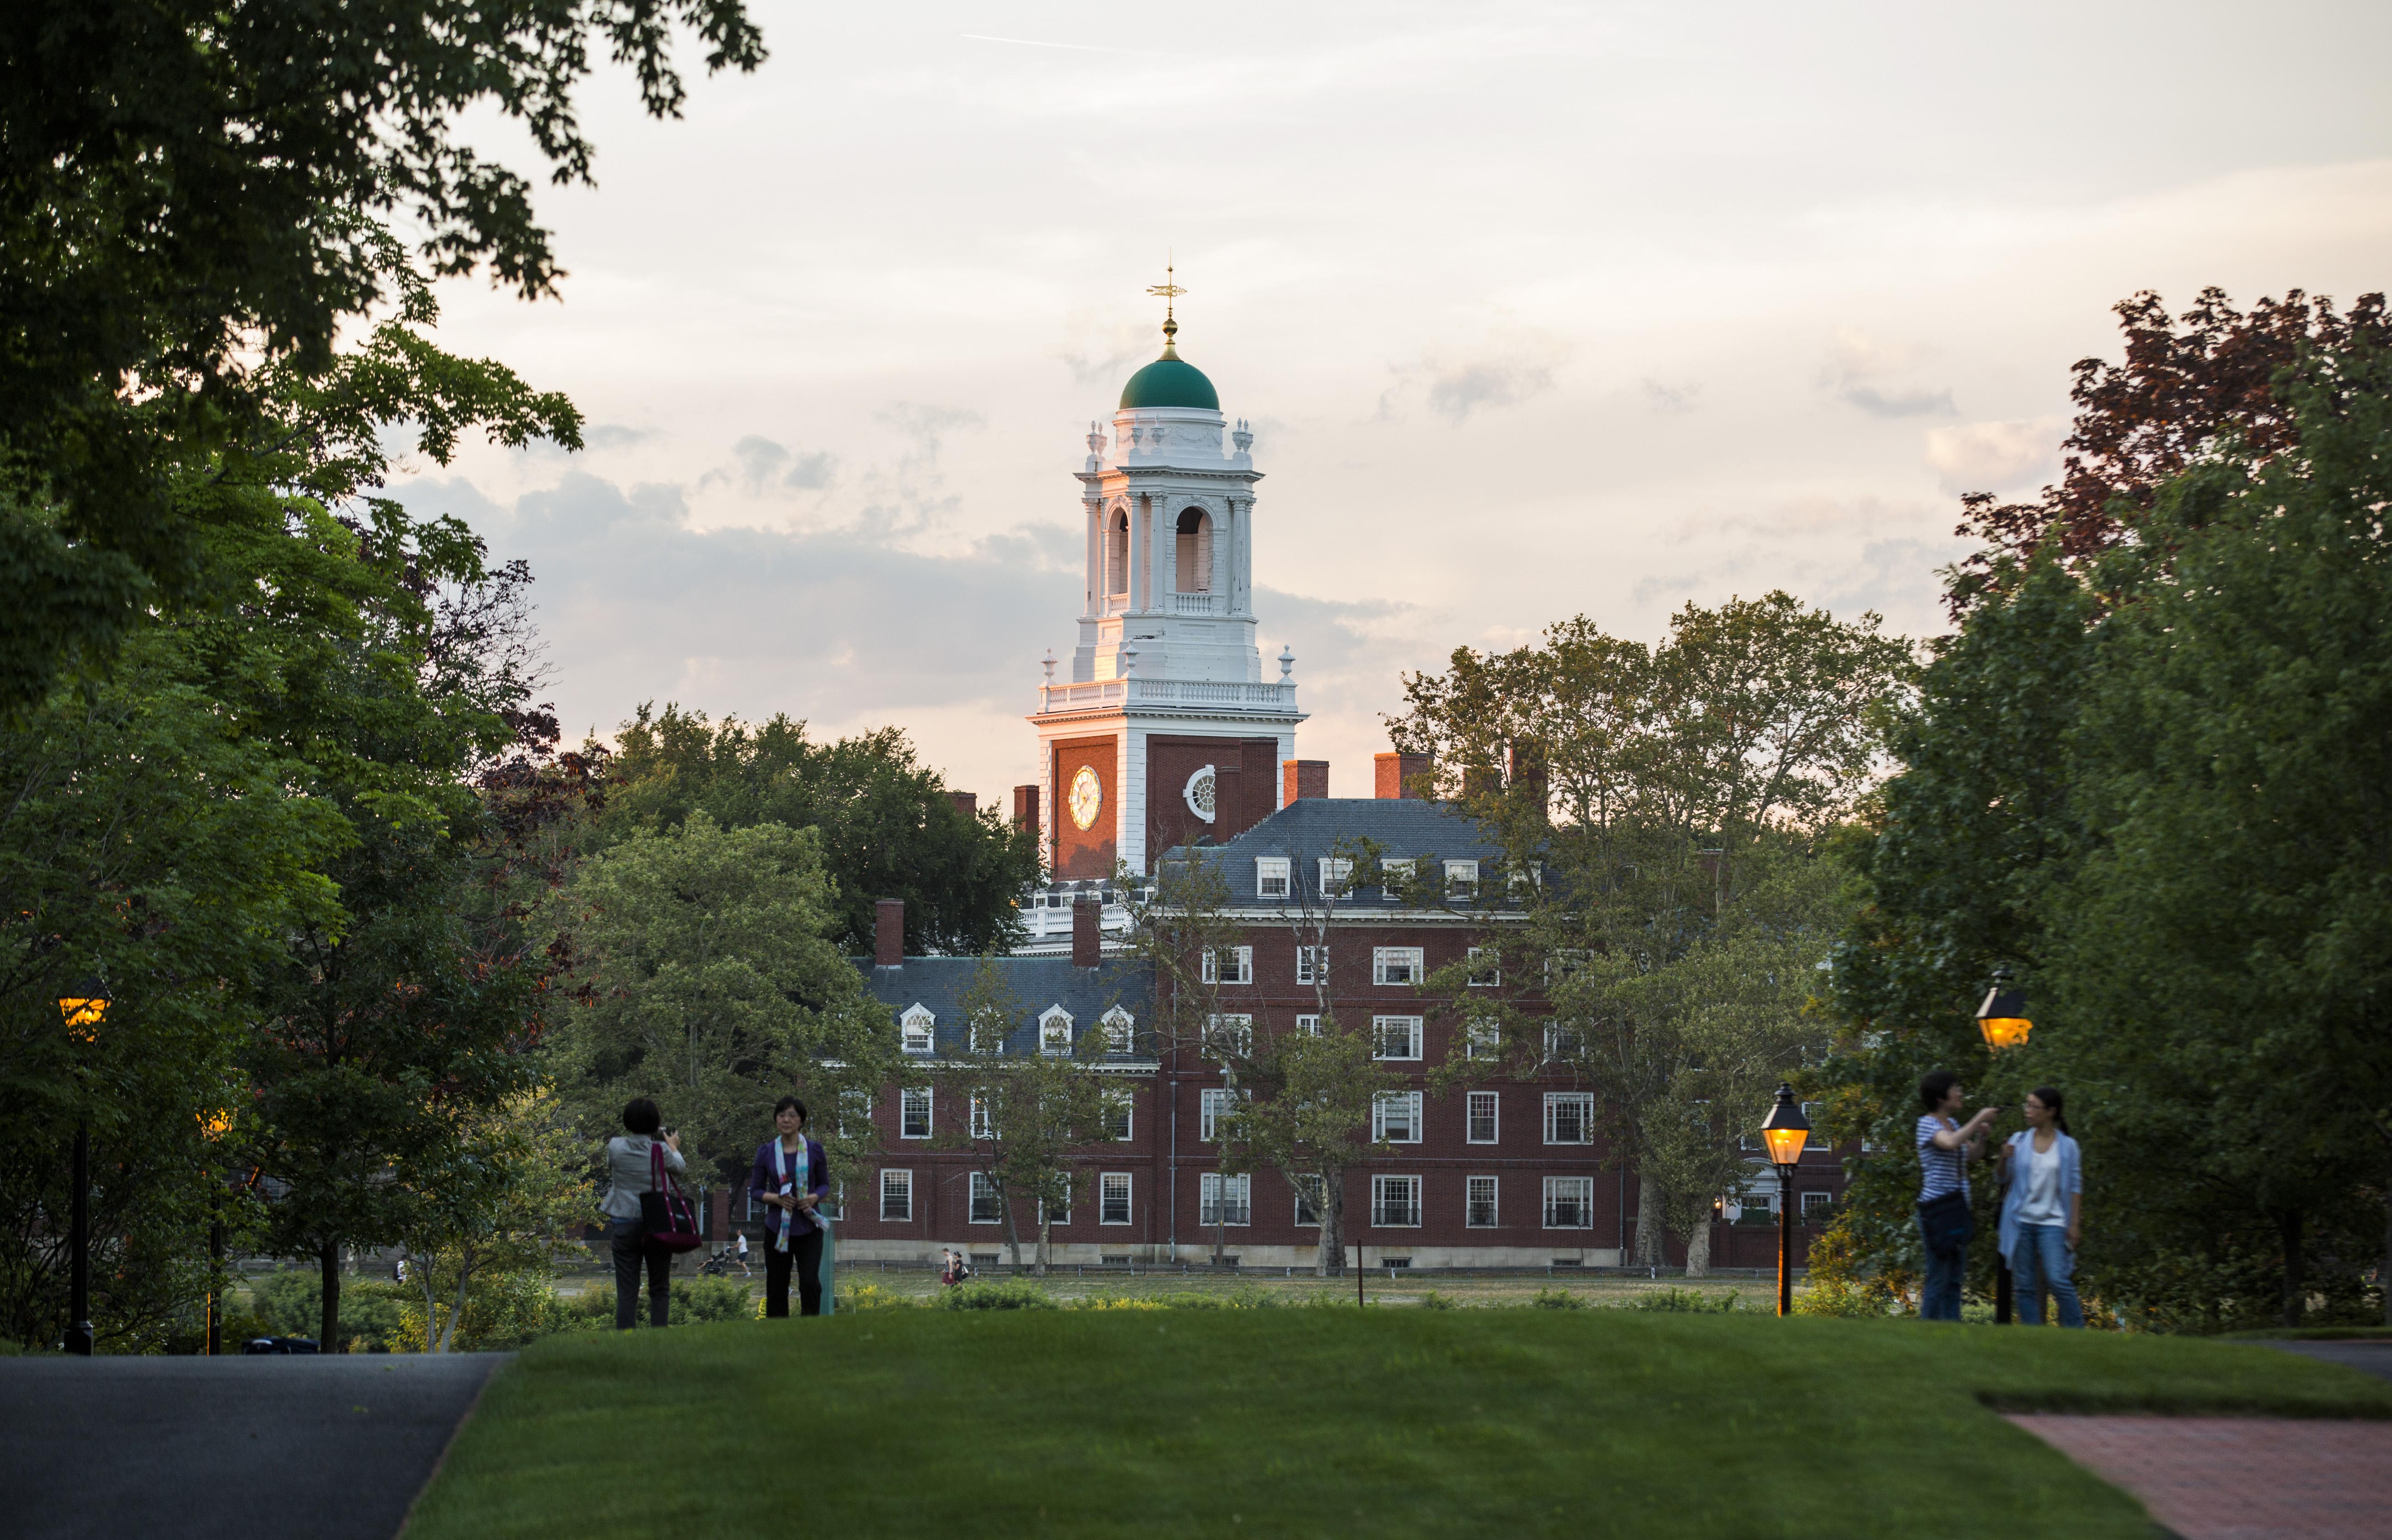 The Campus of Harvard University